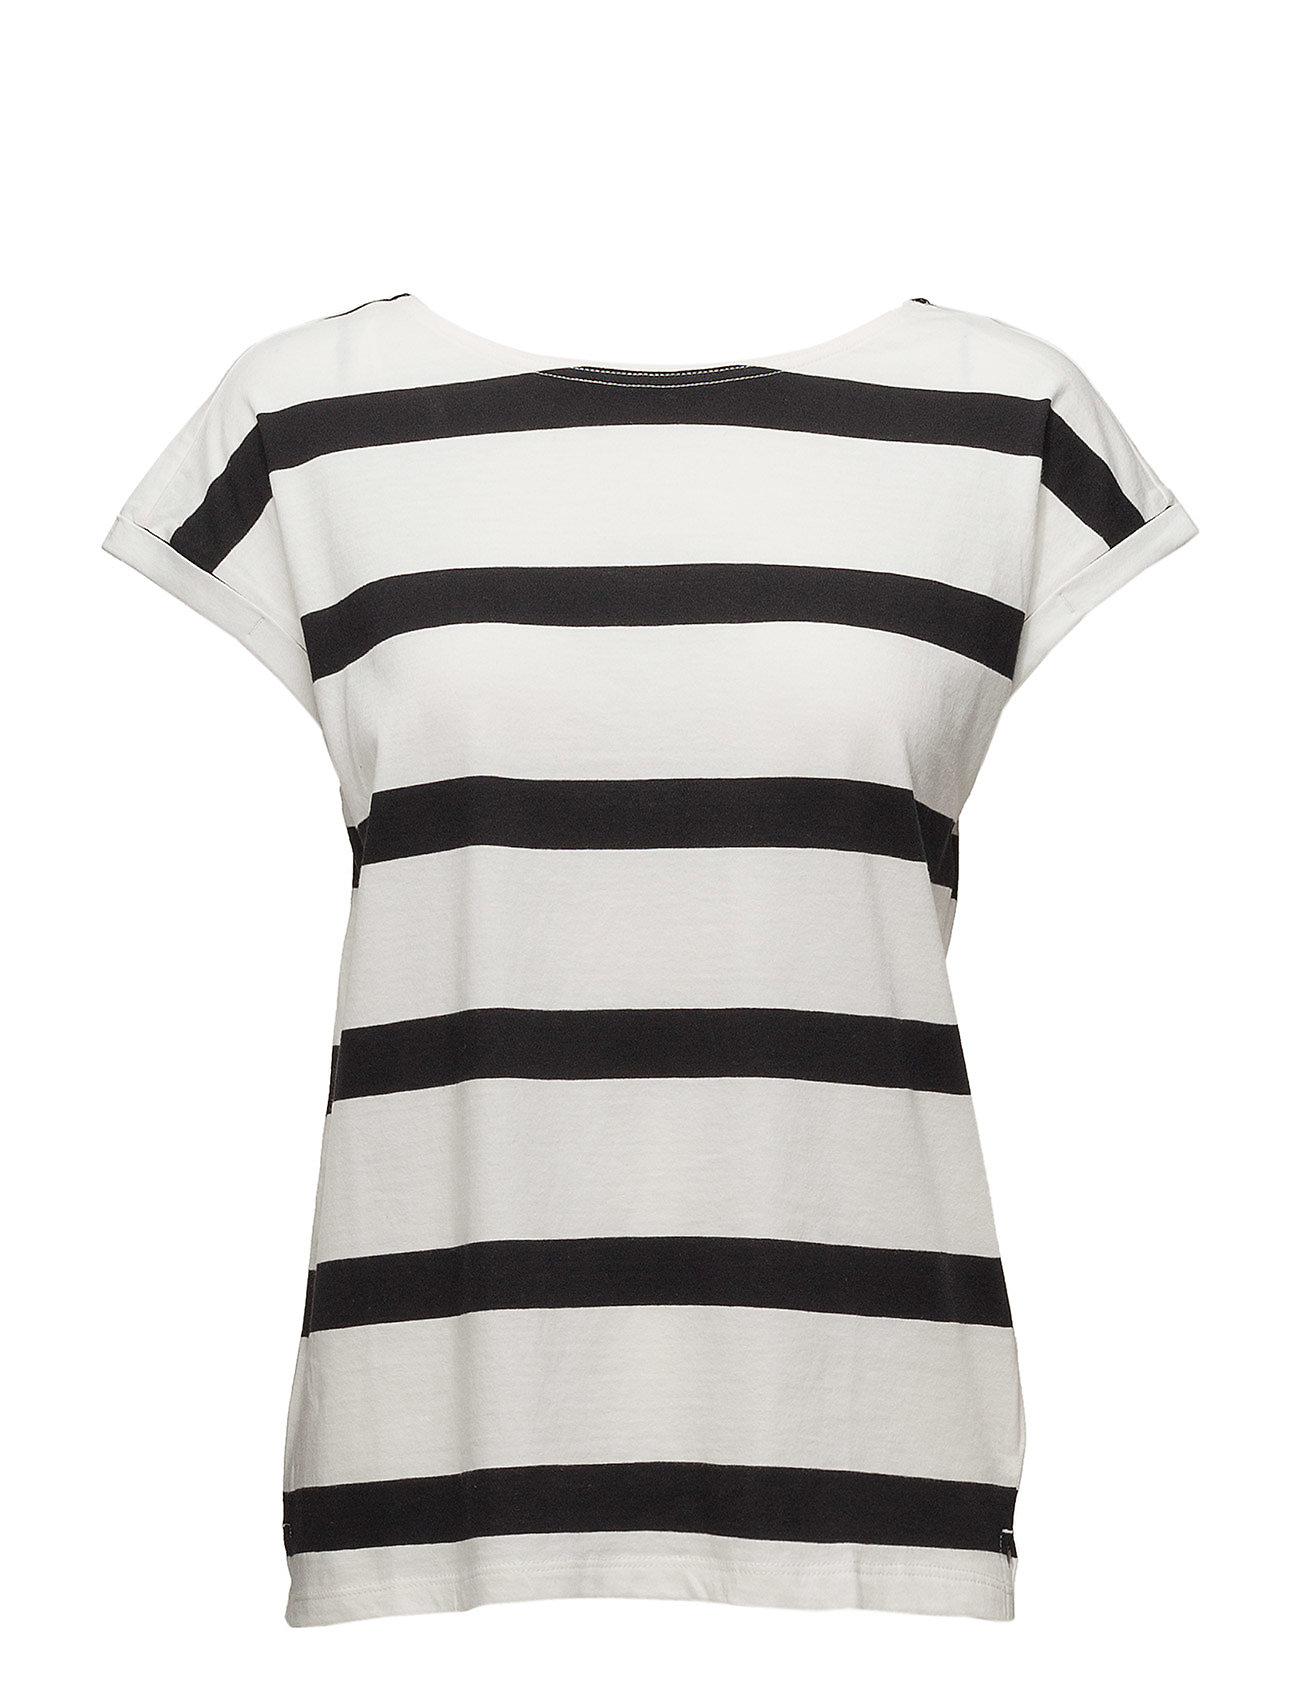 e0f8874fb279 T-shirts (Off White) (£10.50) - EDC by Esprit - T-shirts   Tops ...